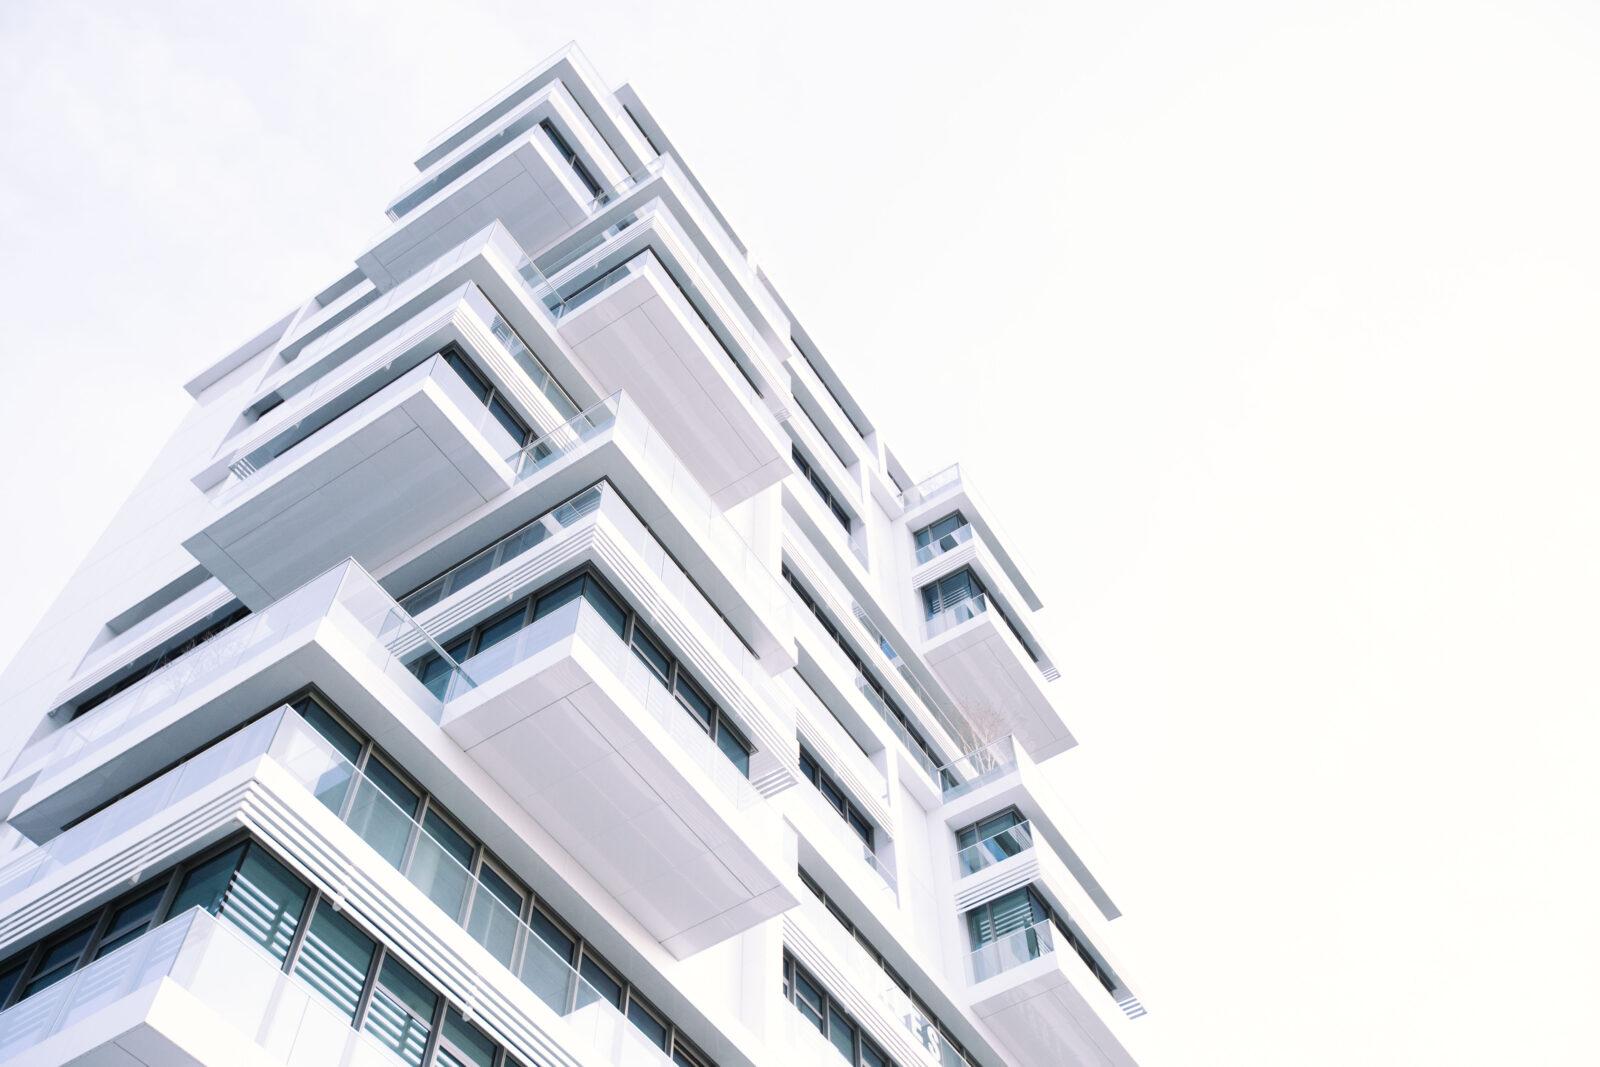 Ny ejerlejlighedslov træder i kraft den 1. juli 2020